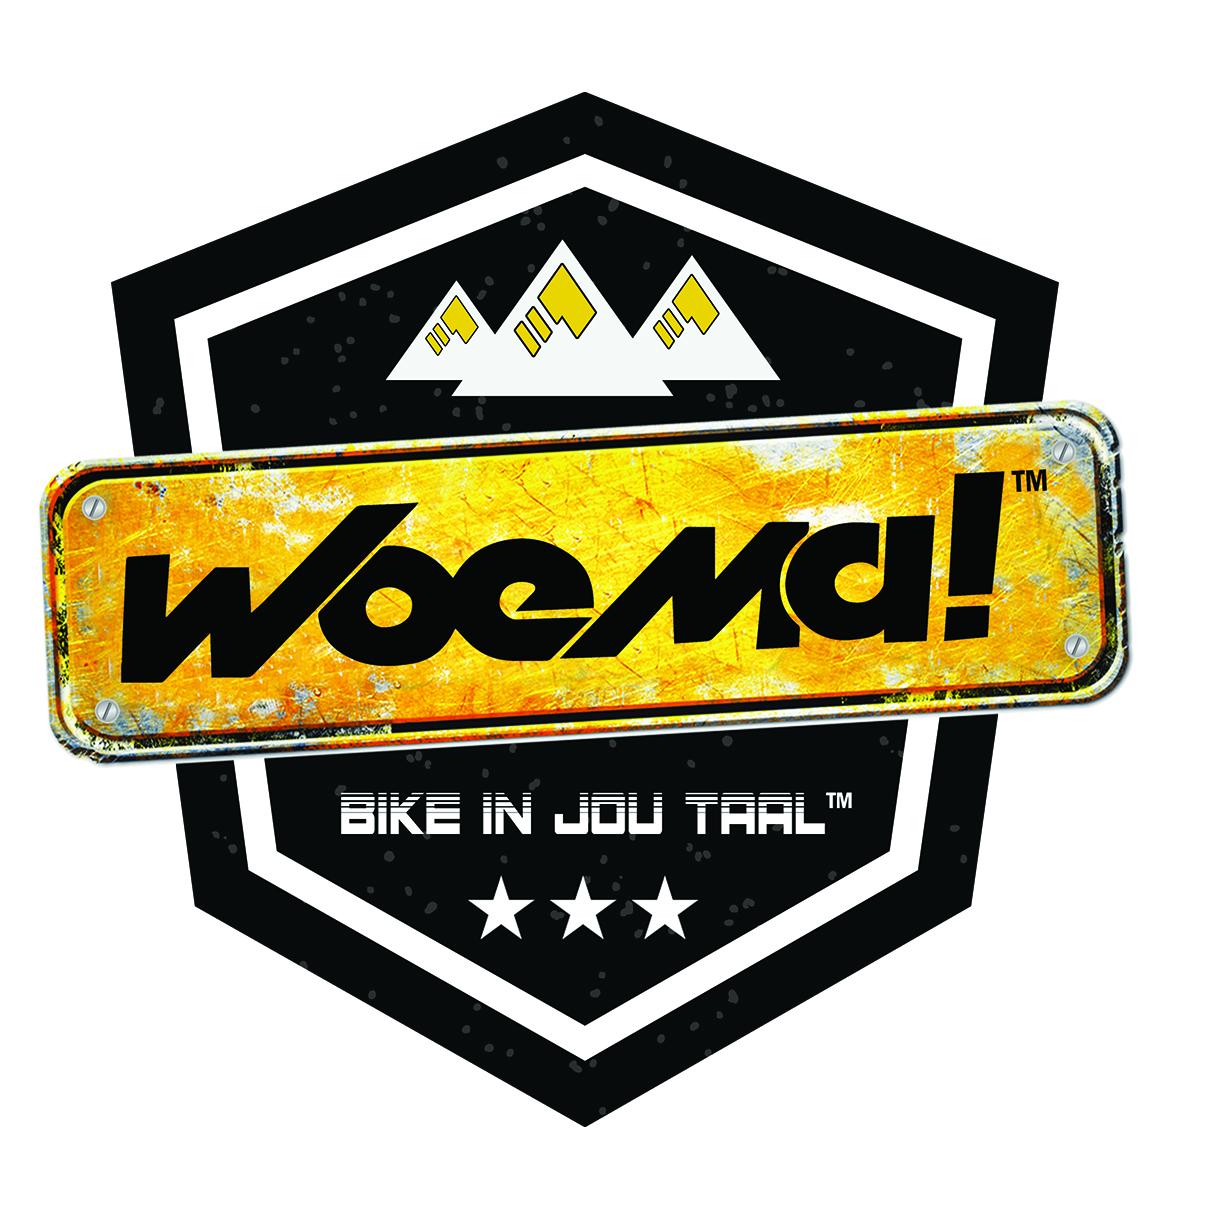 Woema